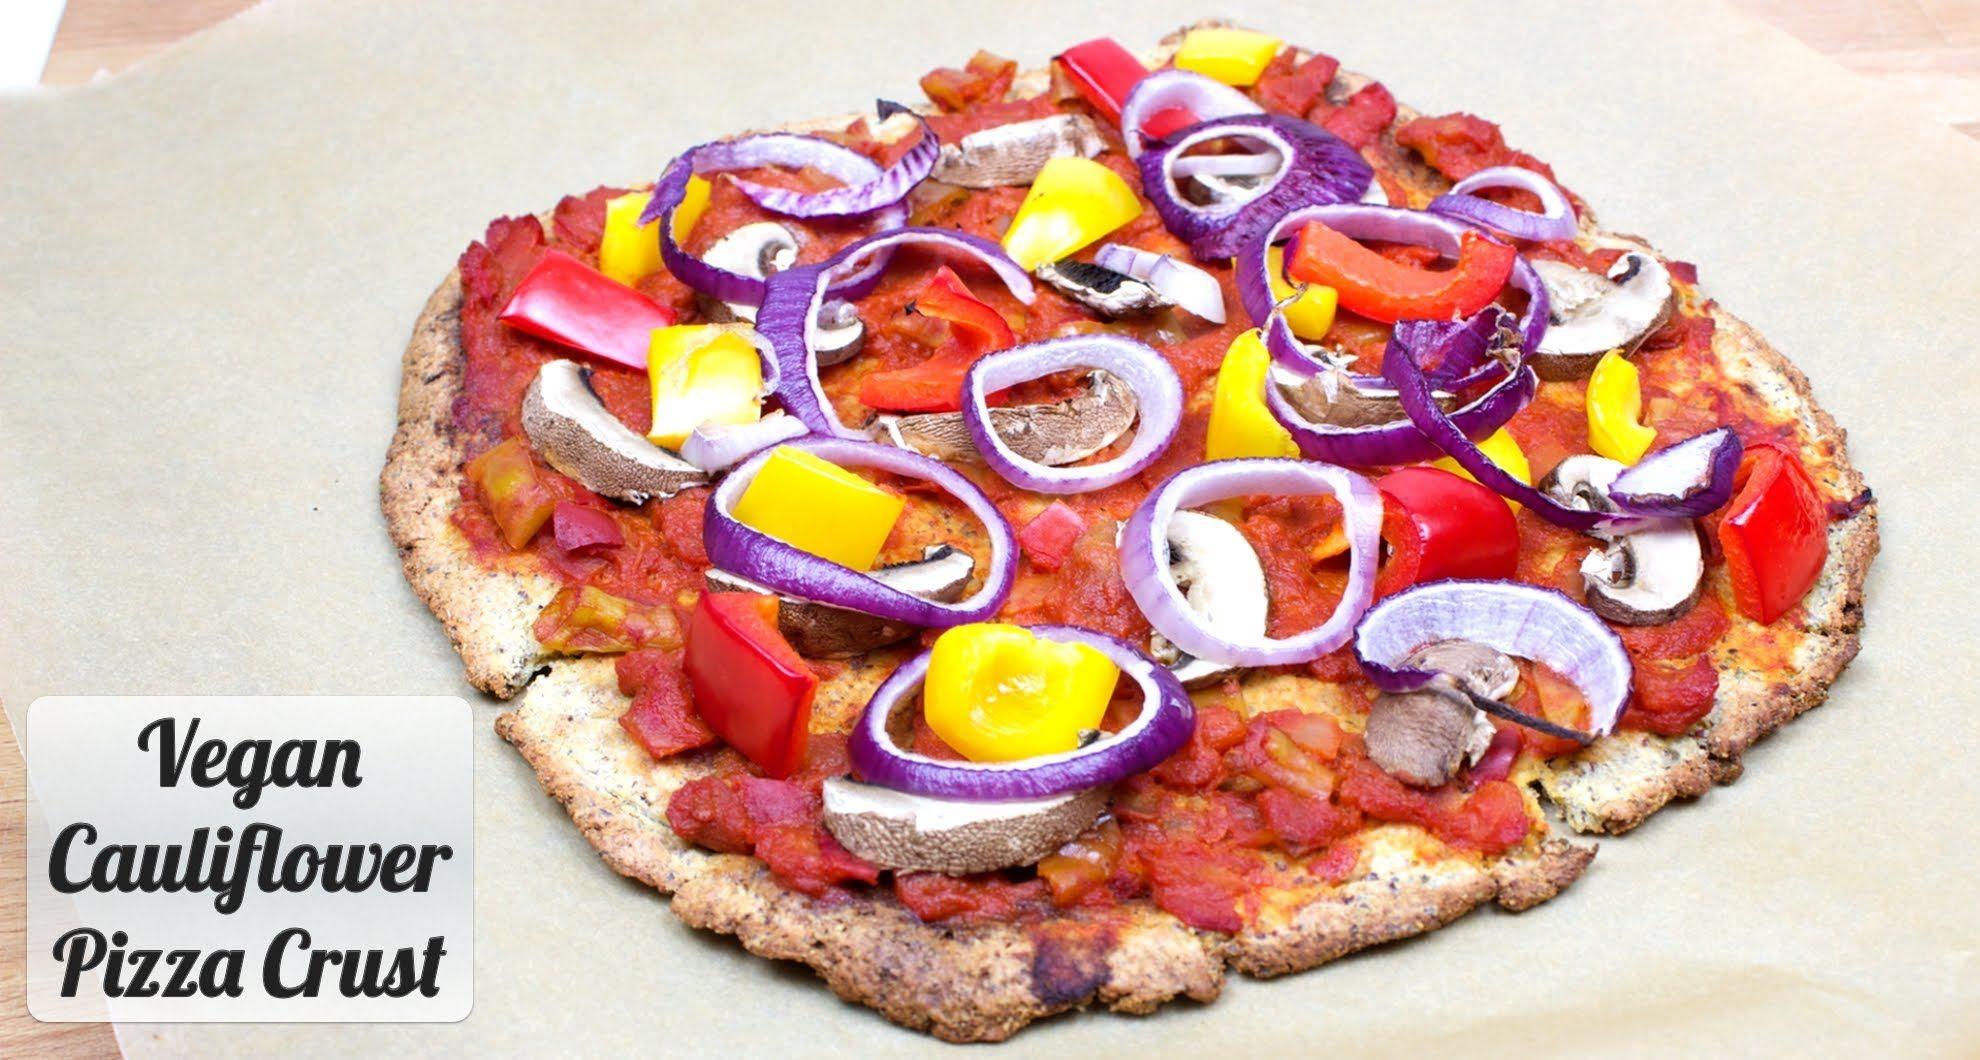 Vegan Cauliflower Pizza Crust Recipe Flax Chia Seeds Blumenkohl Pizzateig Rezepte Pizzateig Rezept